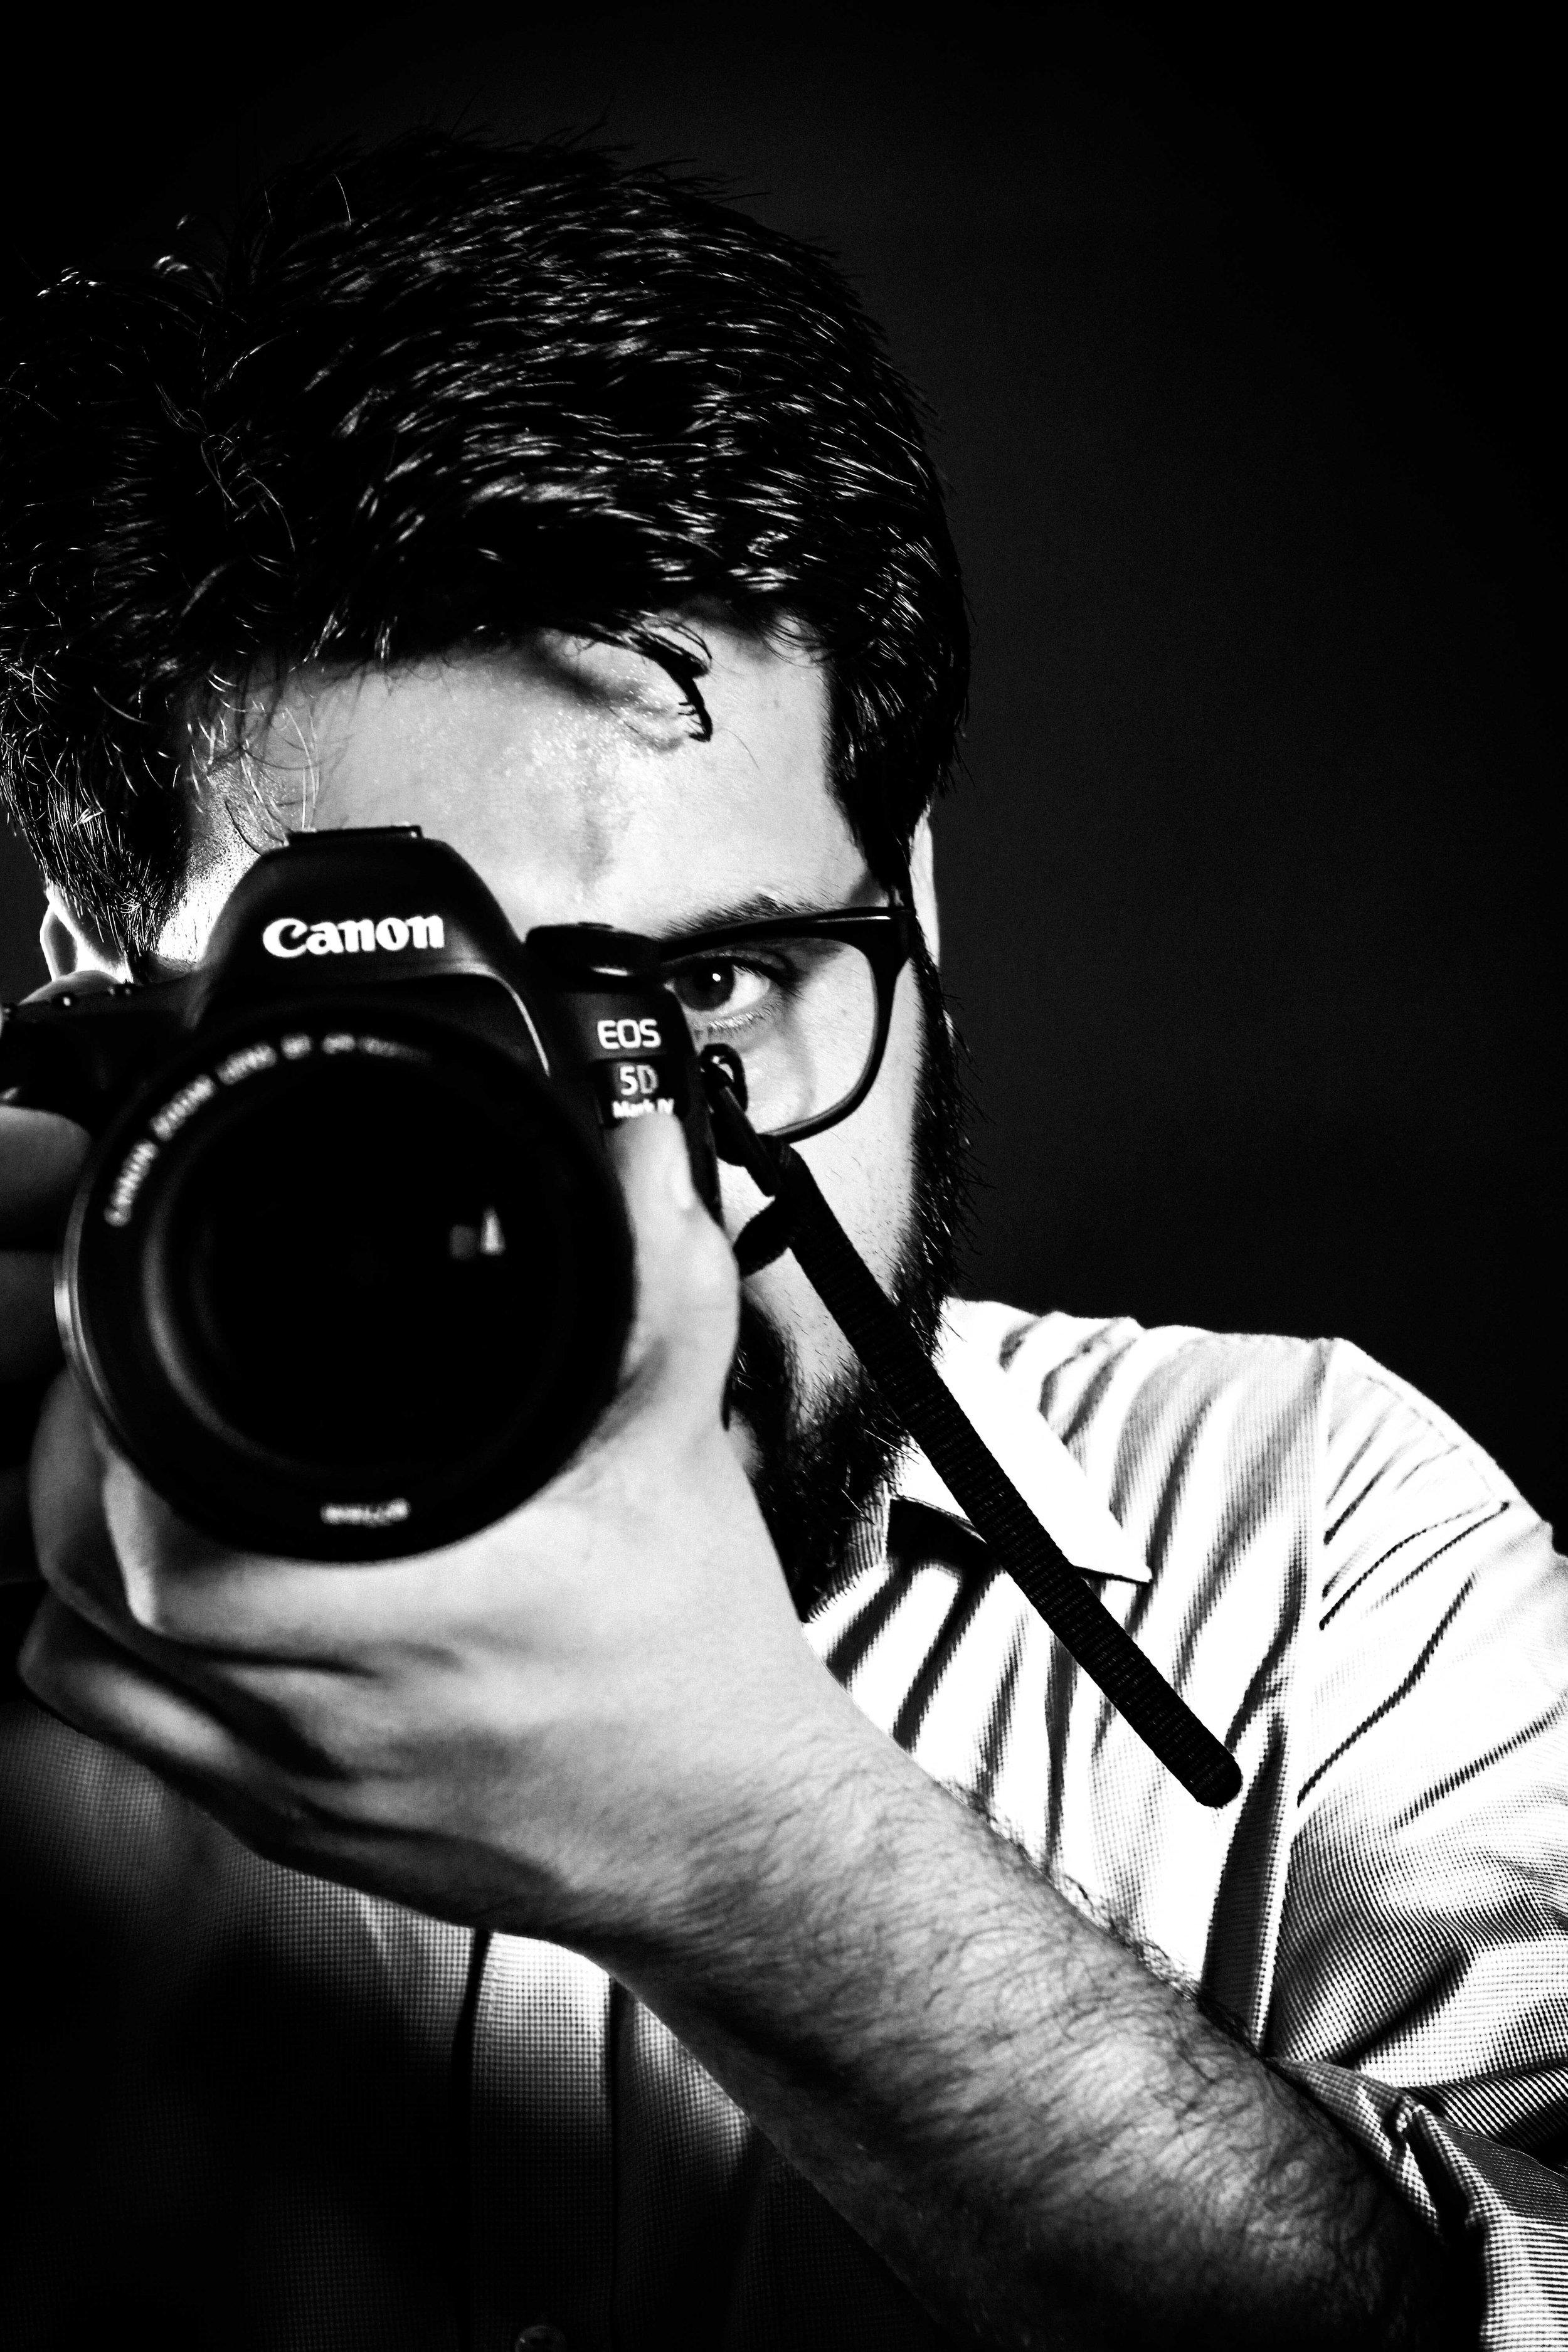 black-and-white-black-background-camera-1265718.jpg